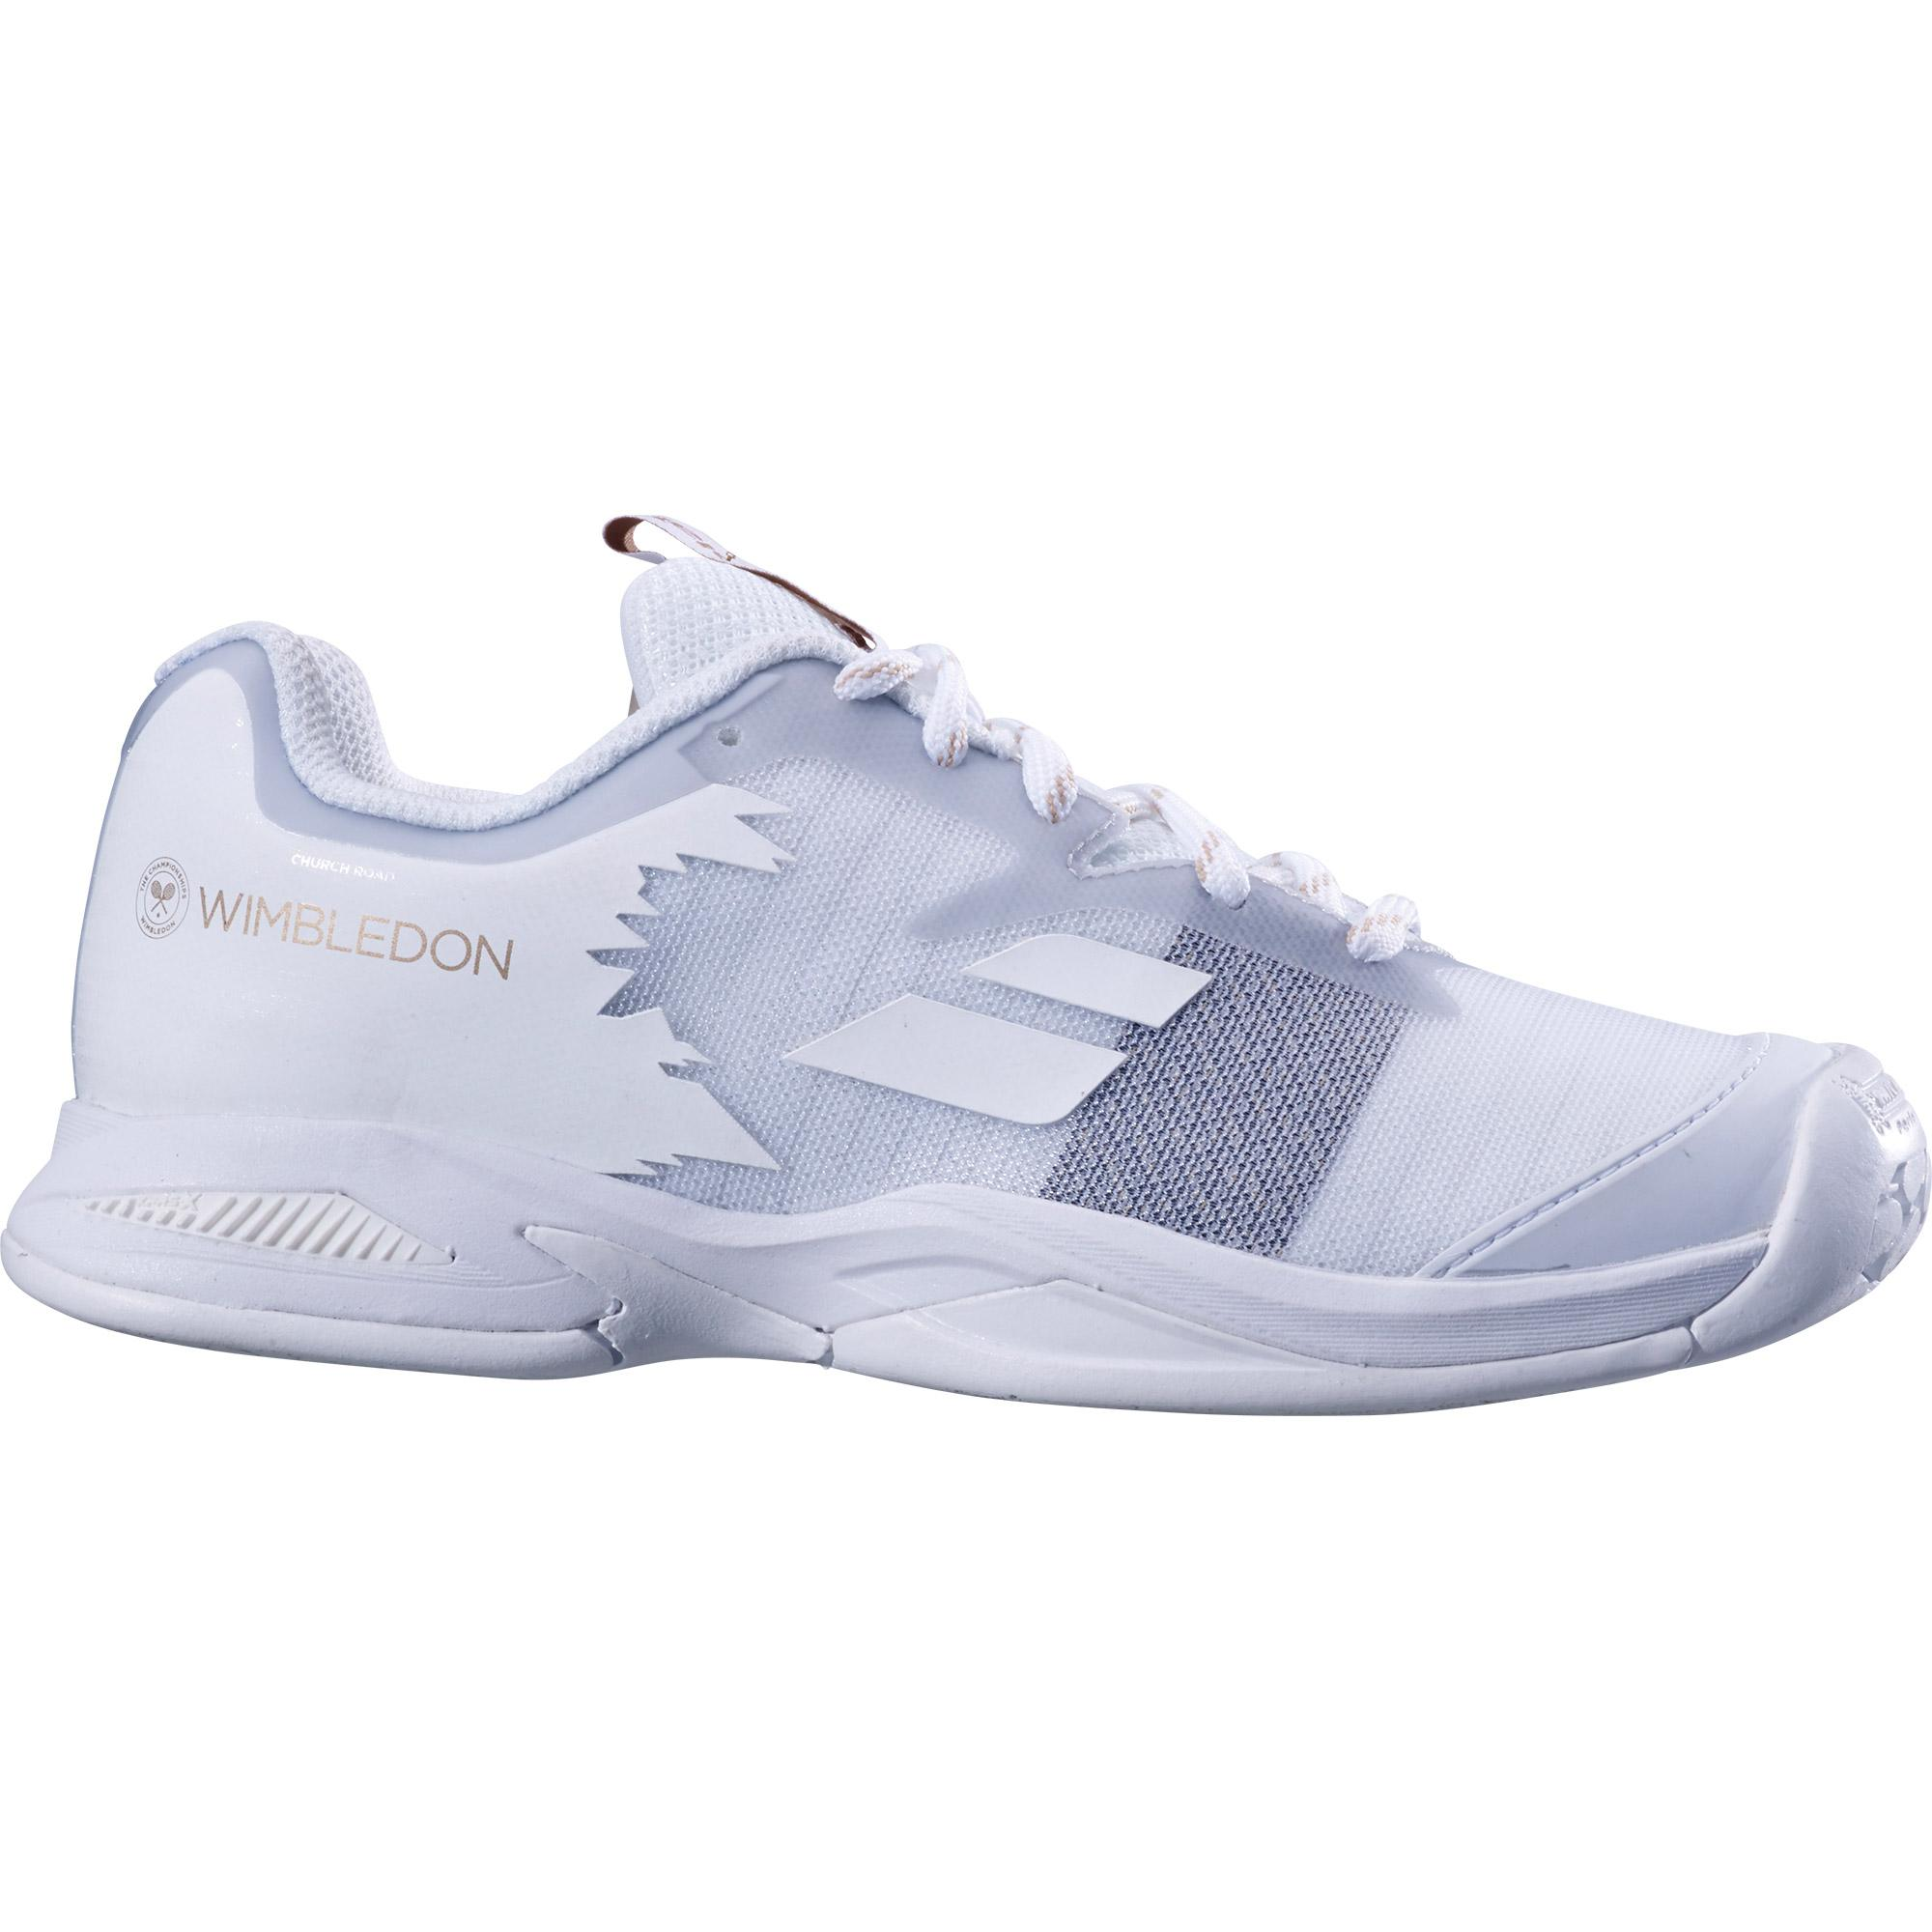 d006b856 Babolat Kids Jet Wimbledon Tennis Shoes - White